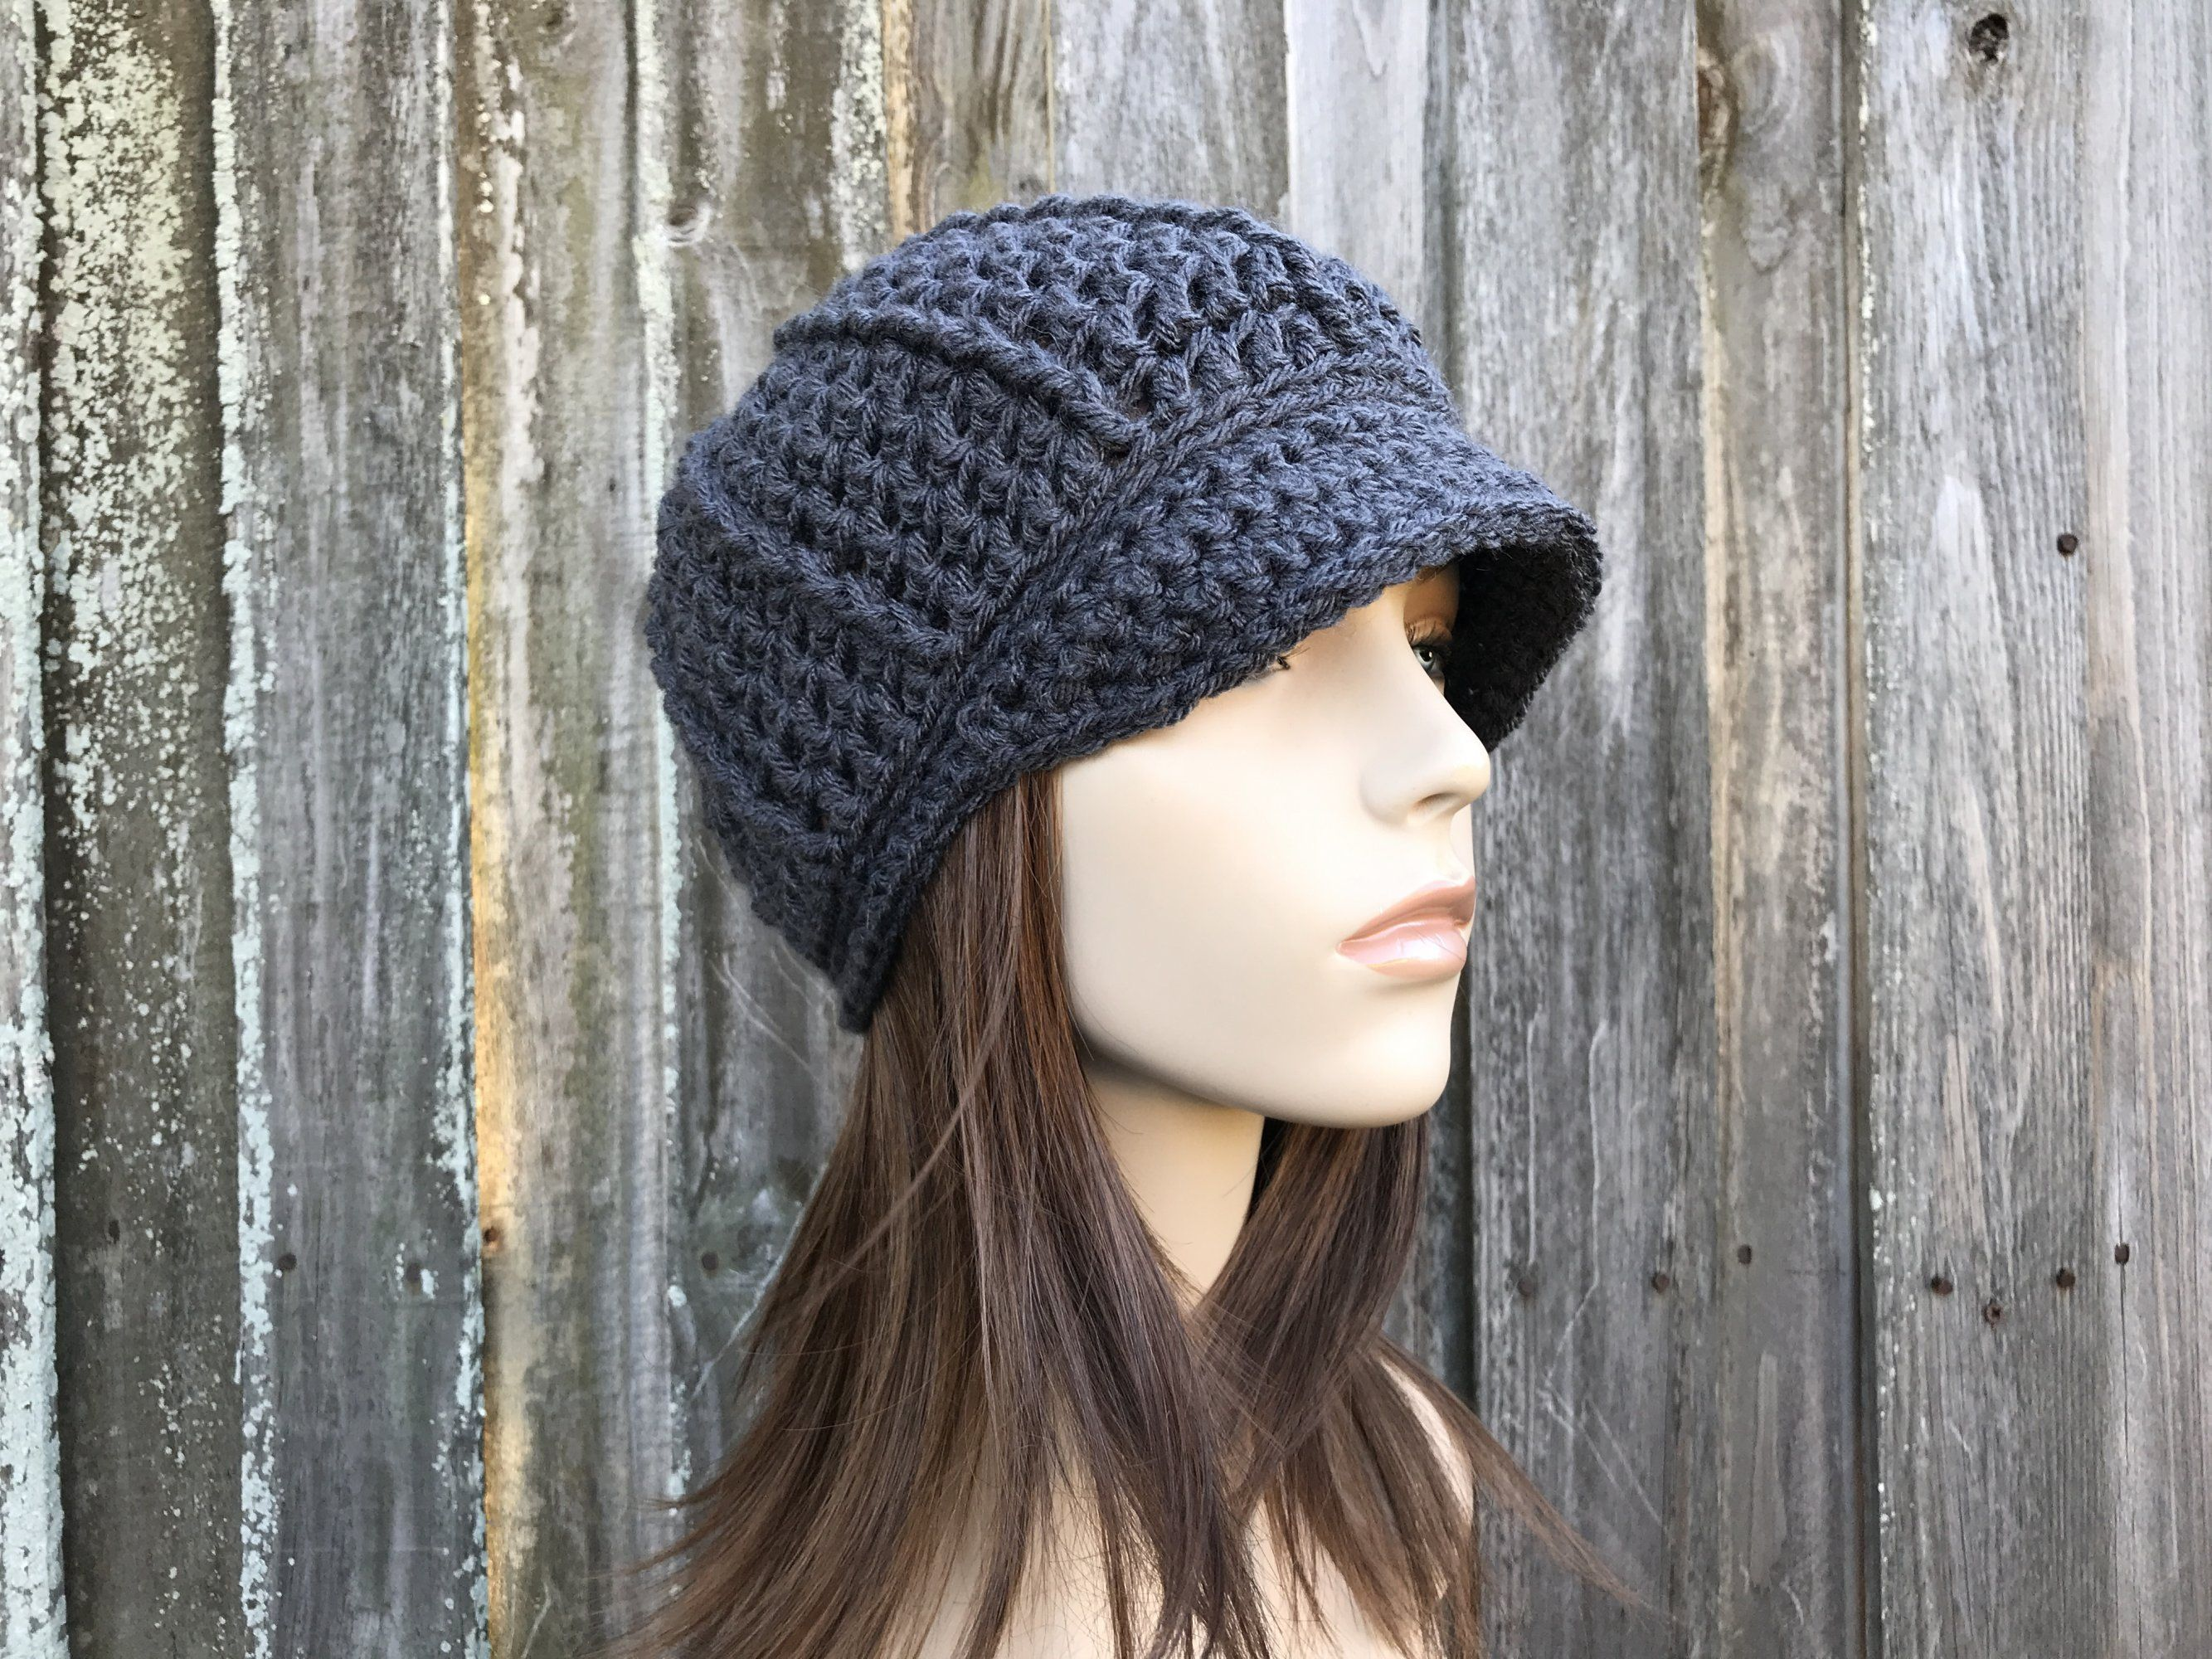 Fitted Beanie Skullcap Mustard Beanie Yellow Beanie Crochet Womens Hat Mens Hat Light Weight Summer Beanie Beach Hat Crochet Beanie